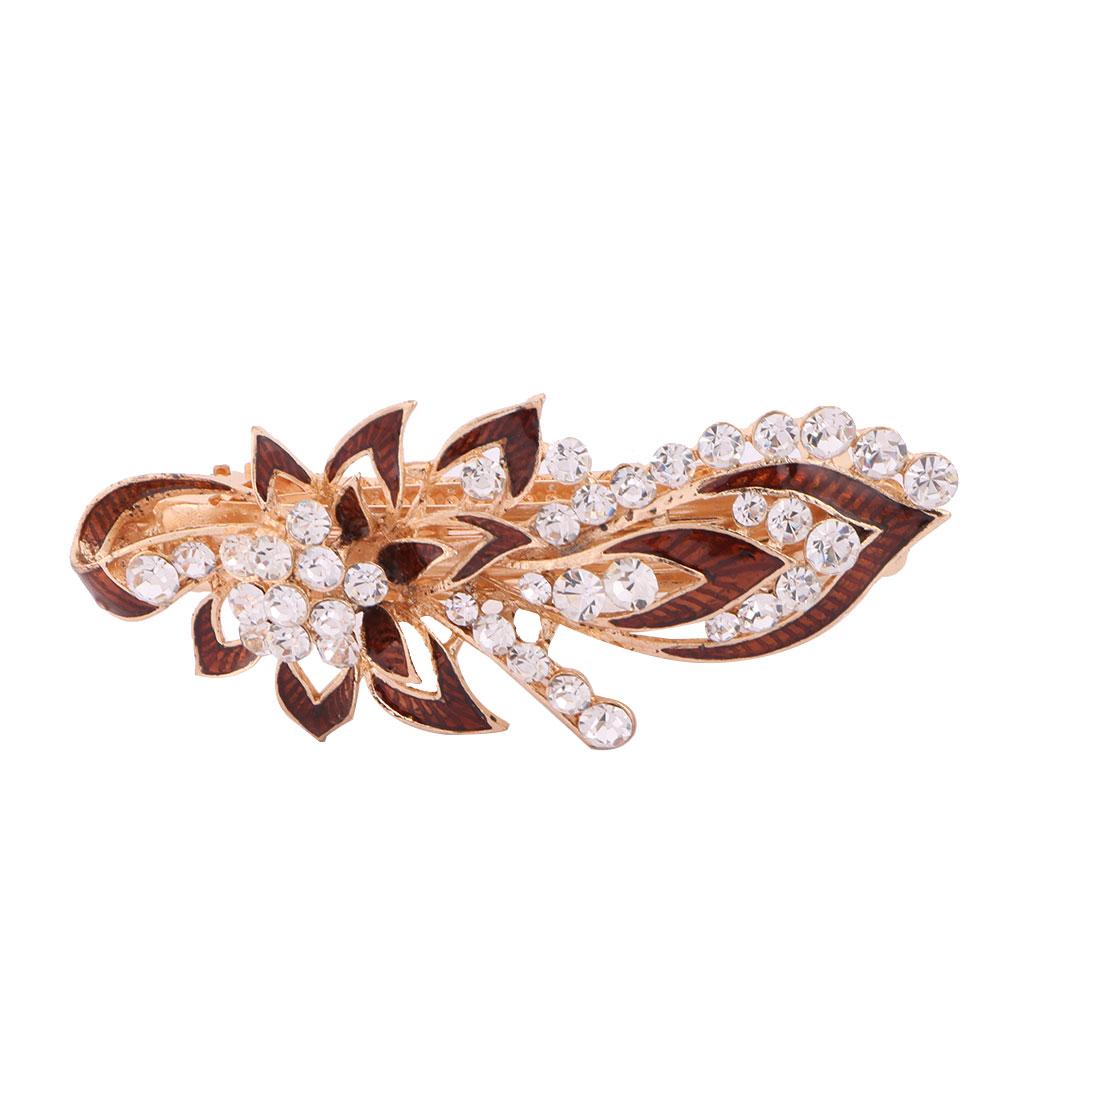 Ladies Metal Flower Design Faux Rhinestones Inlaid Hair Clip Clasp Hairpin Coffee Color